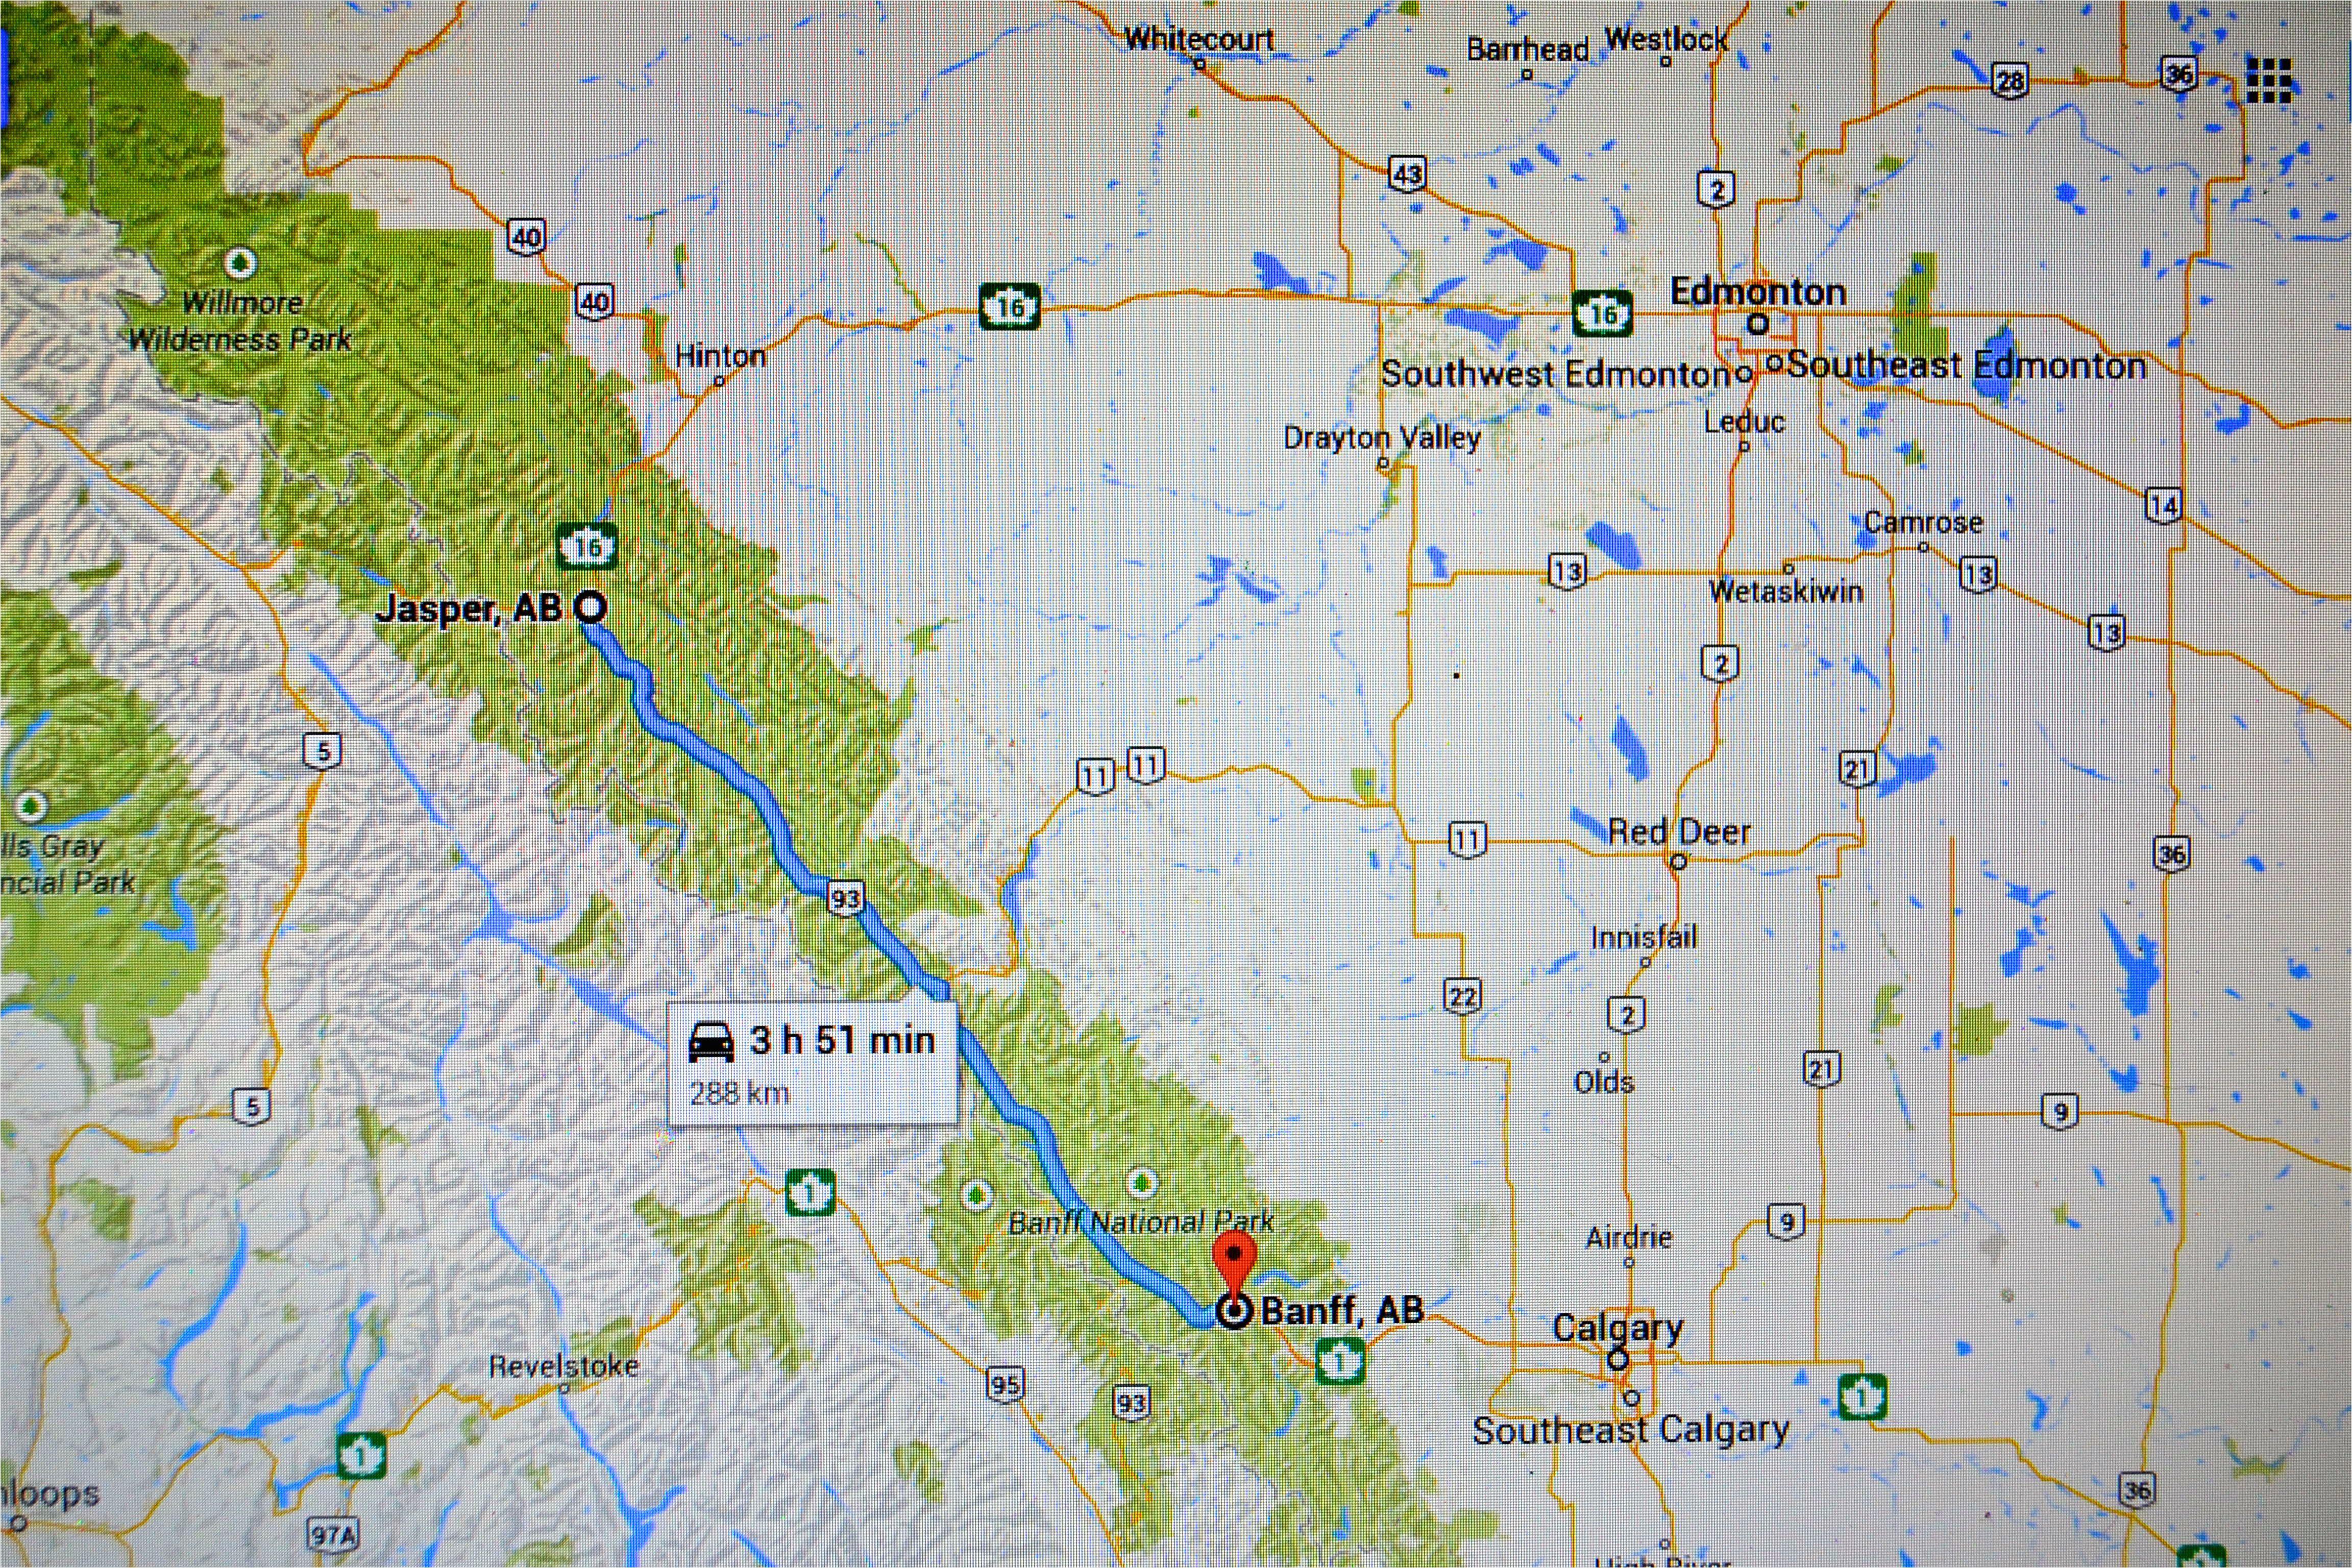 Banff Canada Maps Google Jasper Vs Banff In the Canadian Rockies